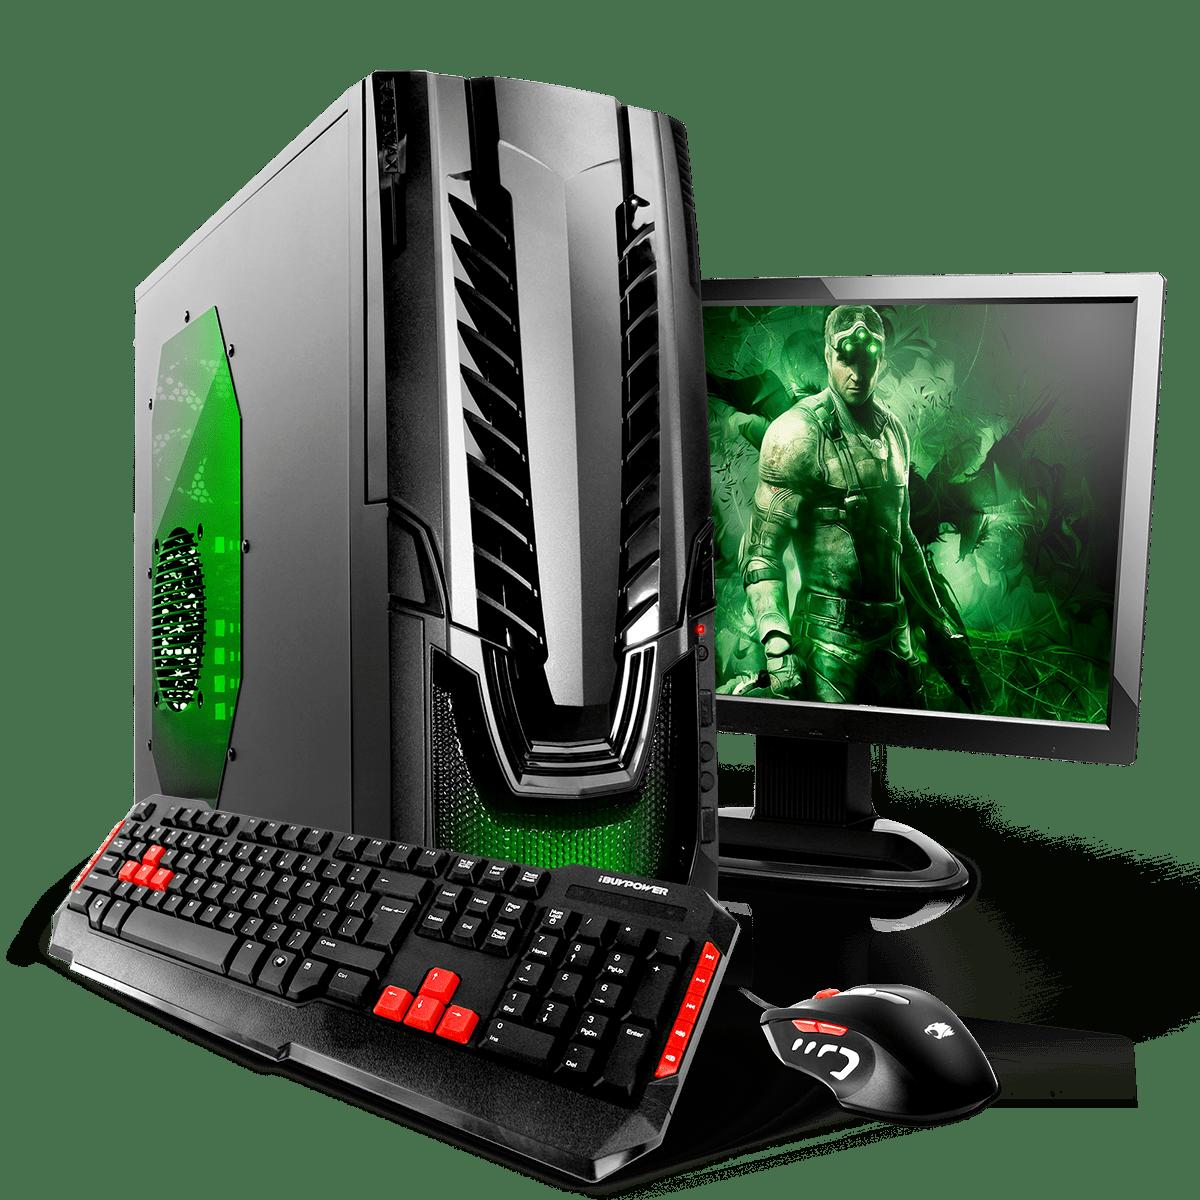 iBUYPOWER Desktop: i5-7600K, 8GB DDR4, 1TB, GTX 1060 $699 after $200 Rebates + Free Shipping